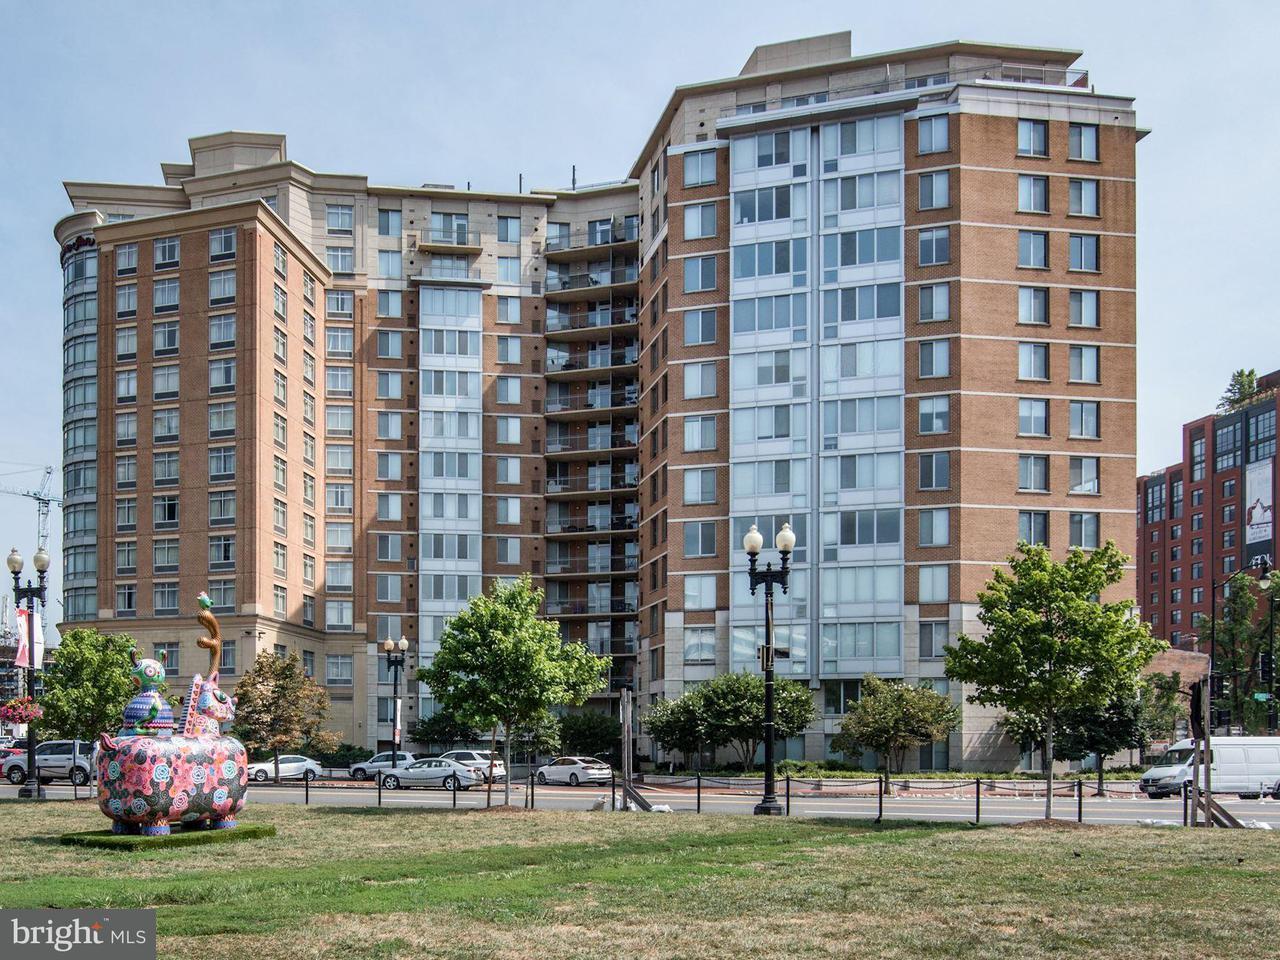 Condominium for Sale at 555 Massachusetts Ave Nw #815 555 Massachusetts Ave Nw #815 Washington, District Of Columbia 20001 United States